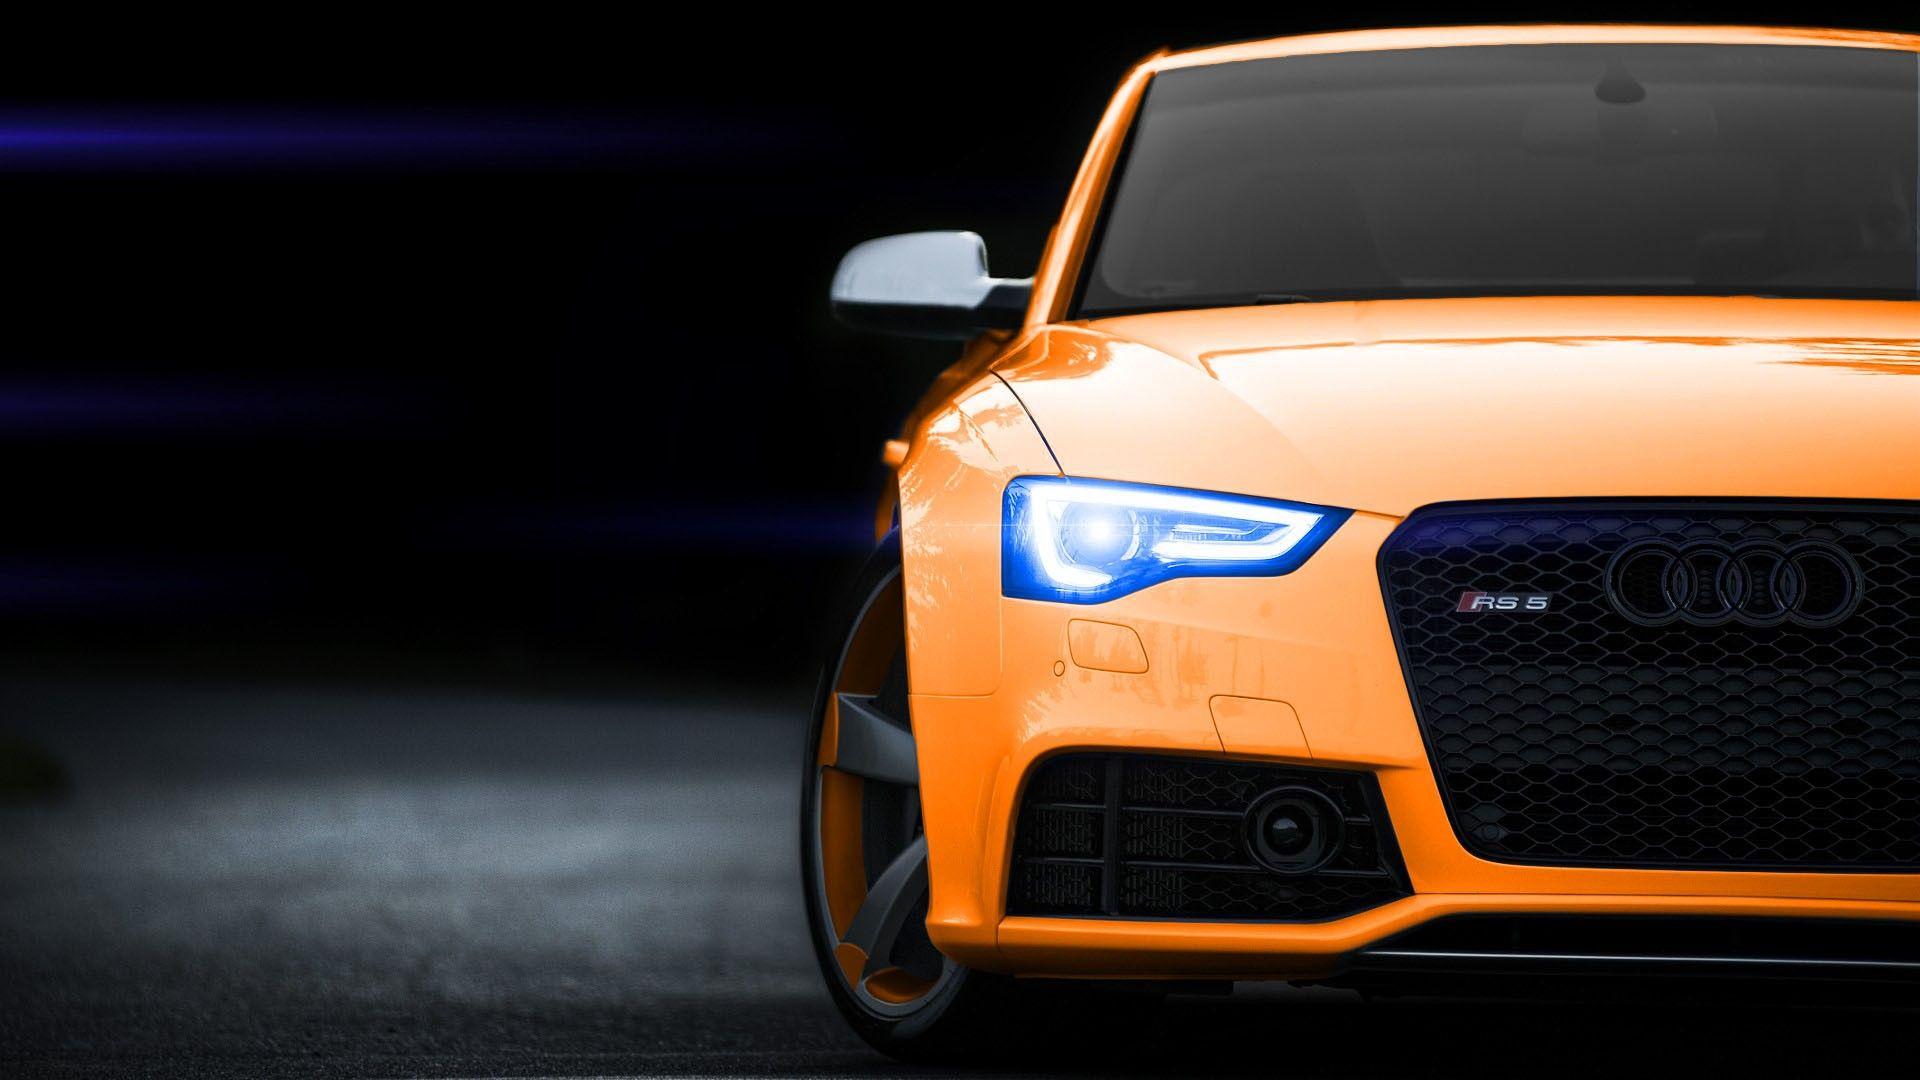 Cars Orange Audi Audi Rs5 Audi Rs5 Audi Audi Rs